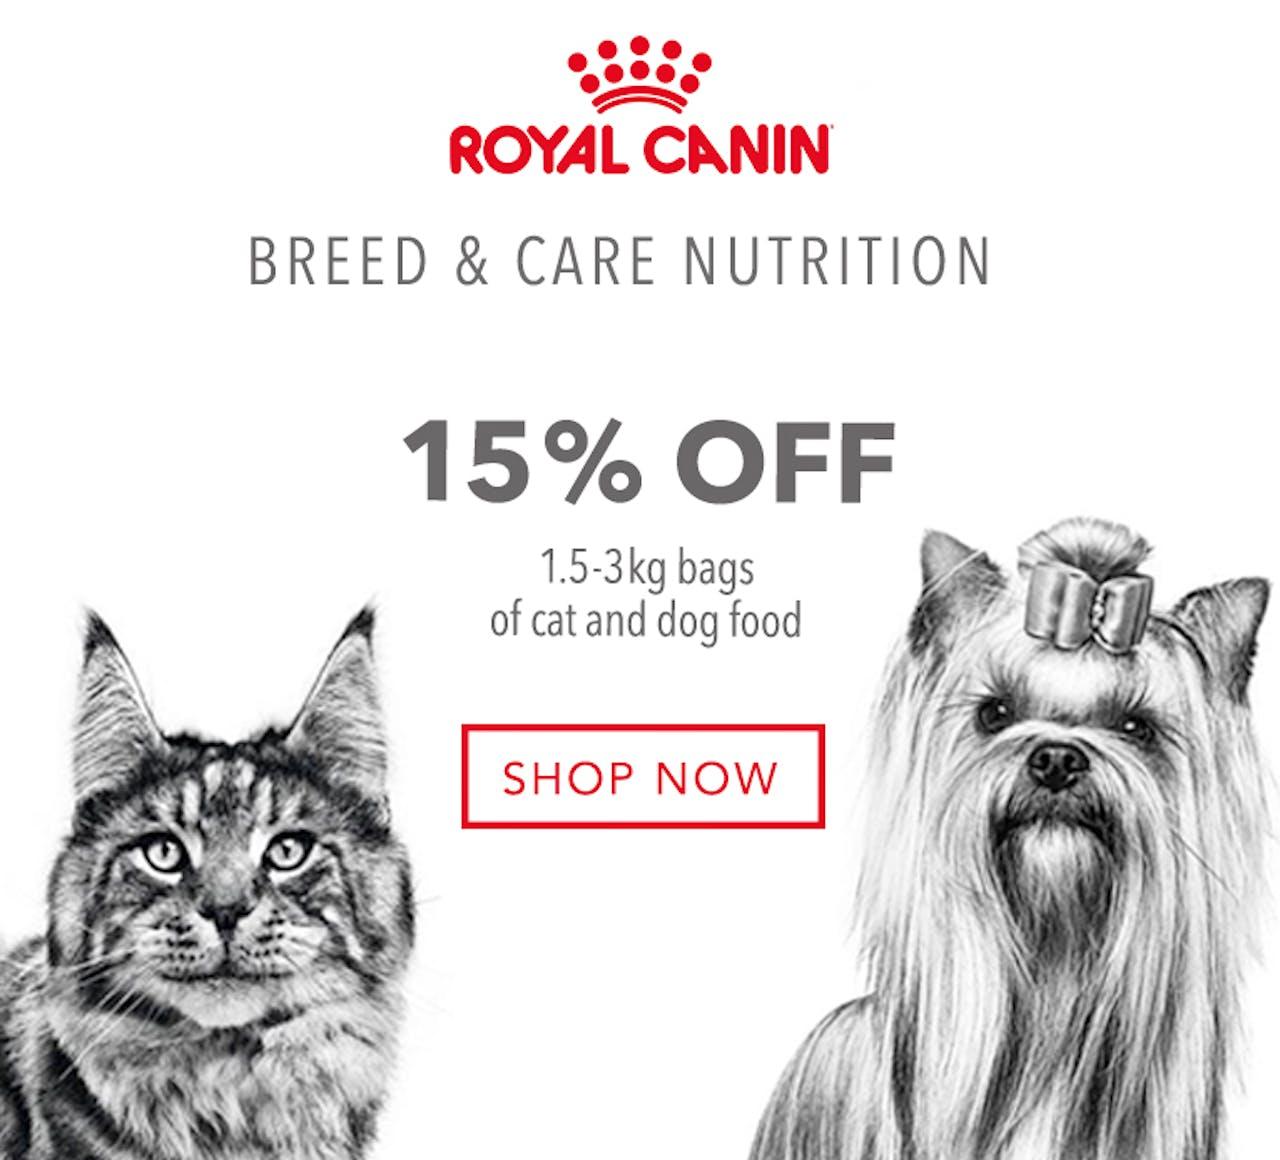 Royal Canin Pet Food Promotion